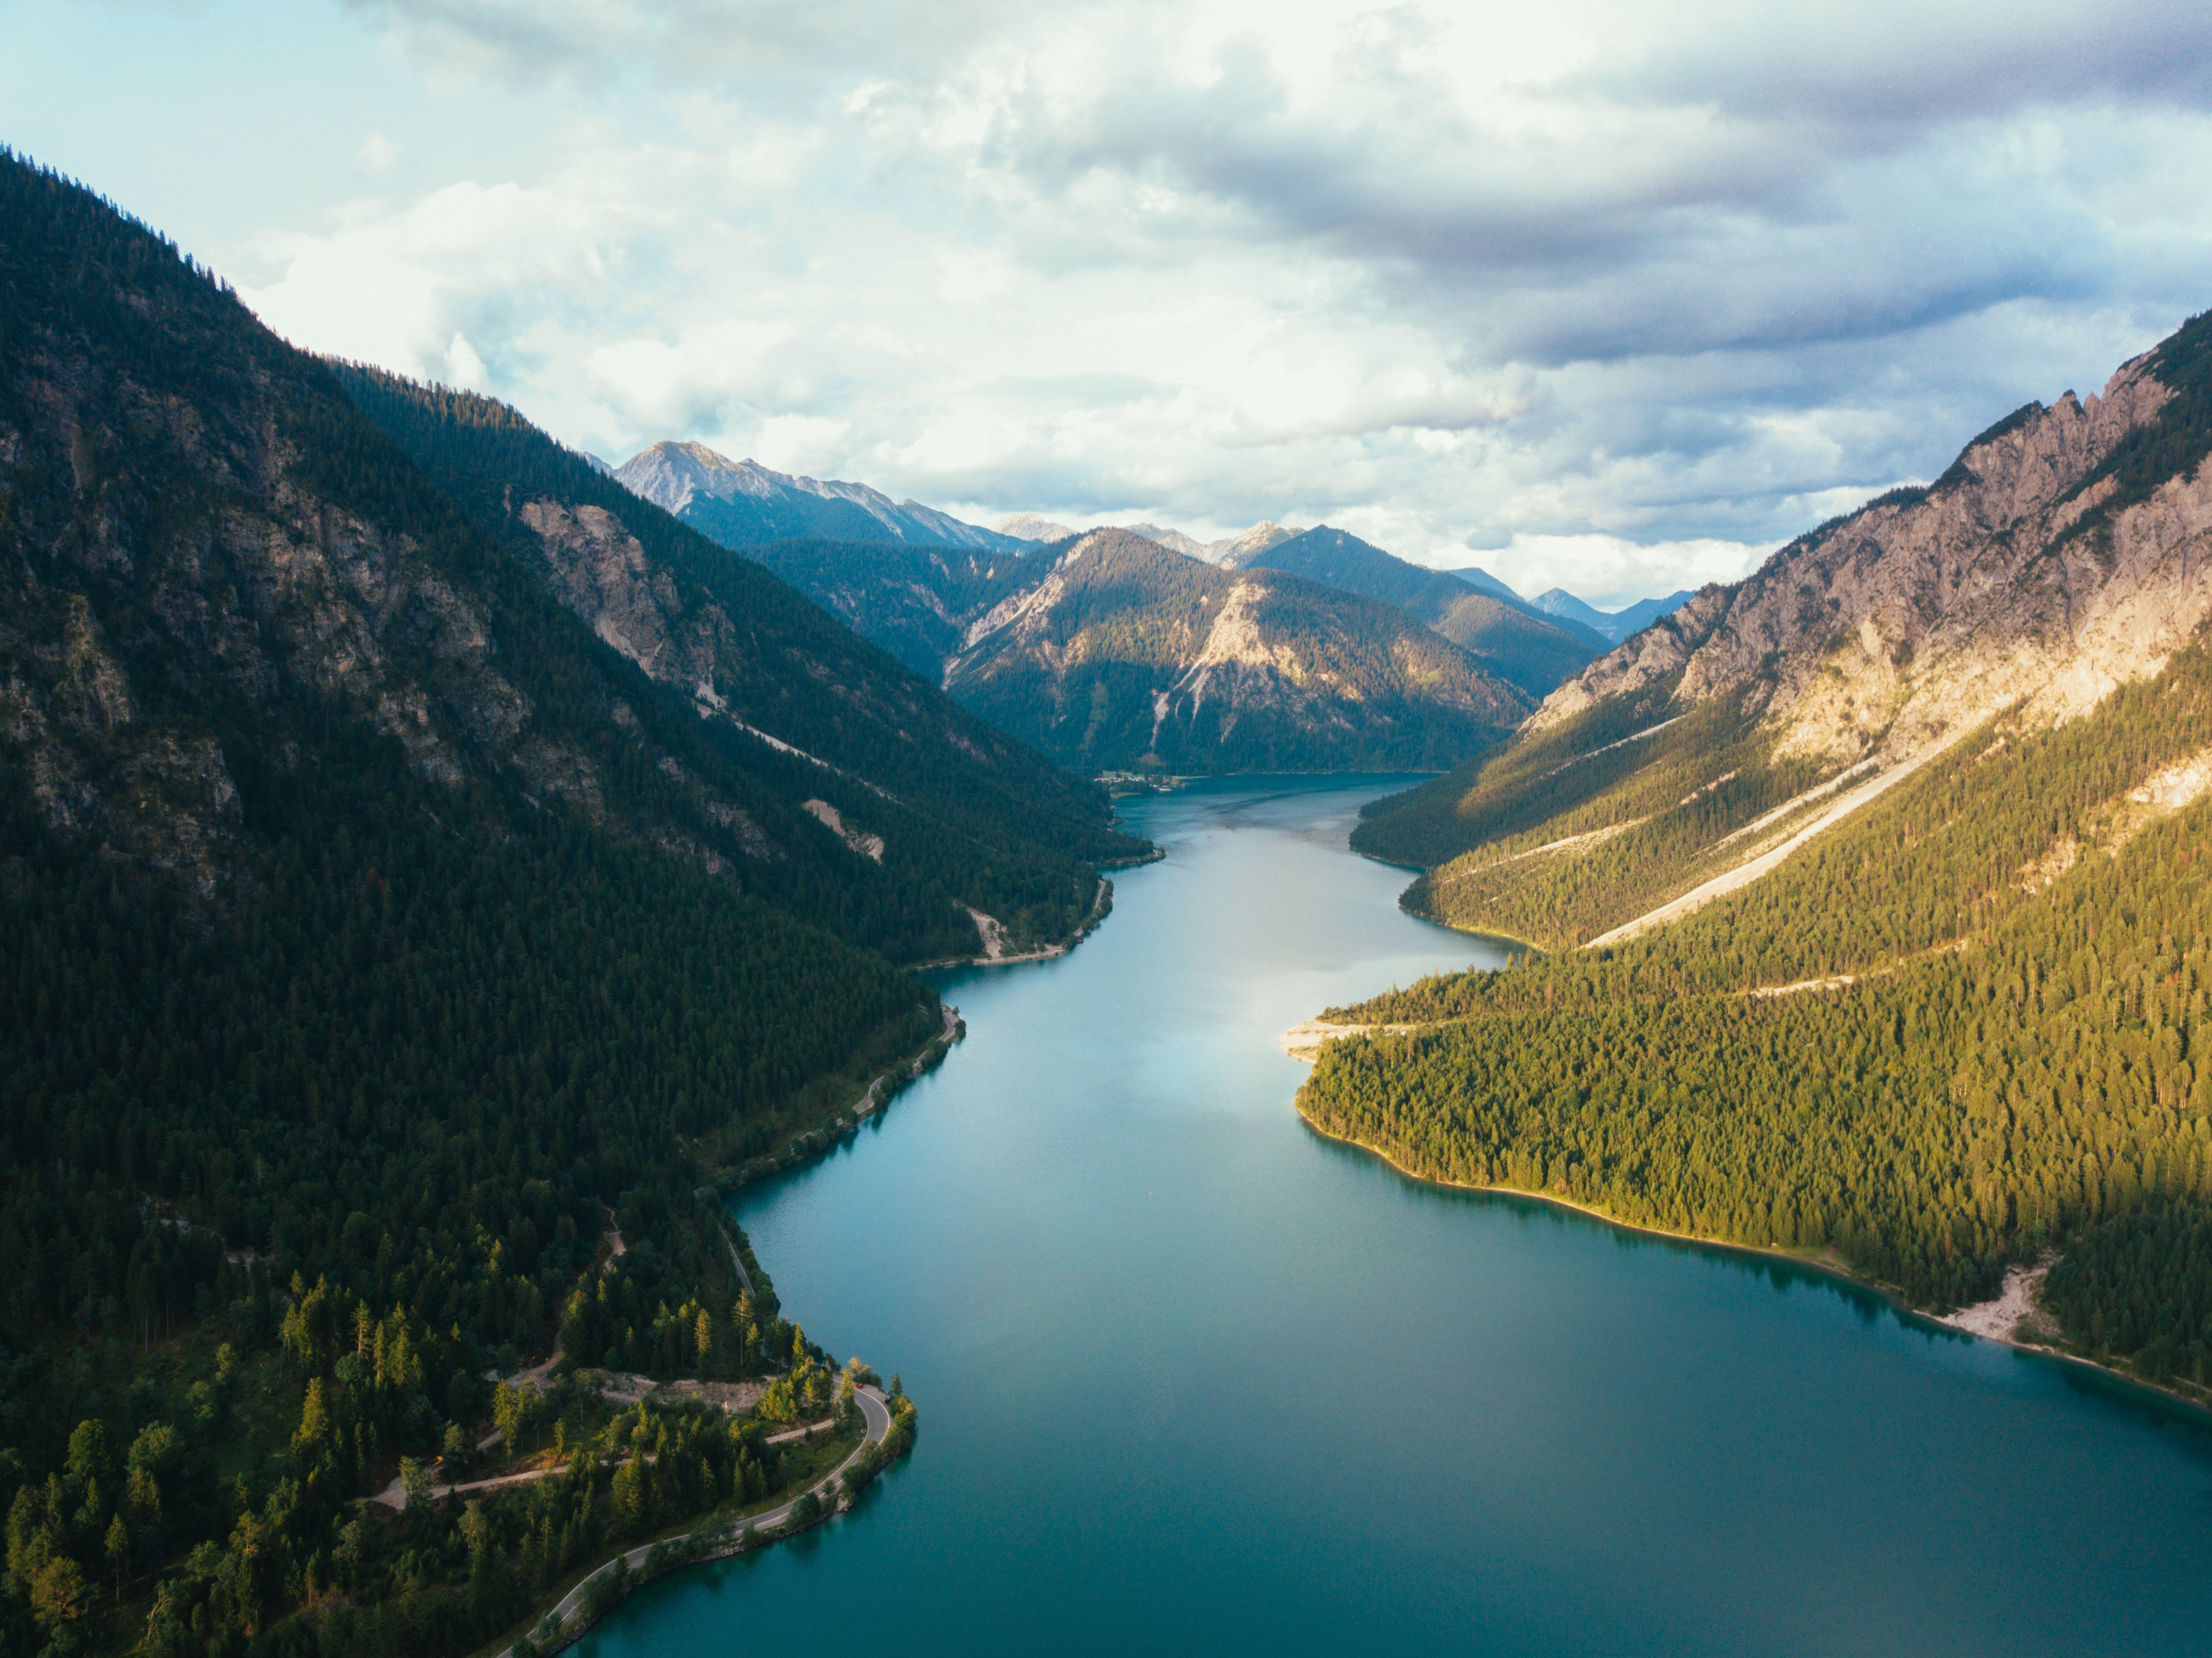 Landscape River Lake And Mountain Hd Photo By Johannes Ludwig Jlu On Unsplash Landscape Pictures Landscape Mountain Images